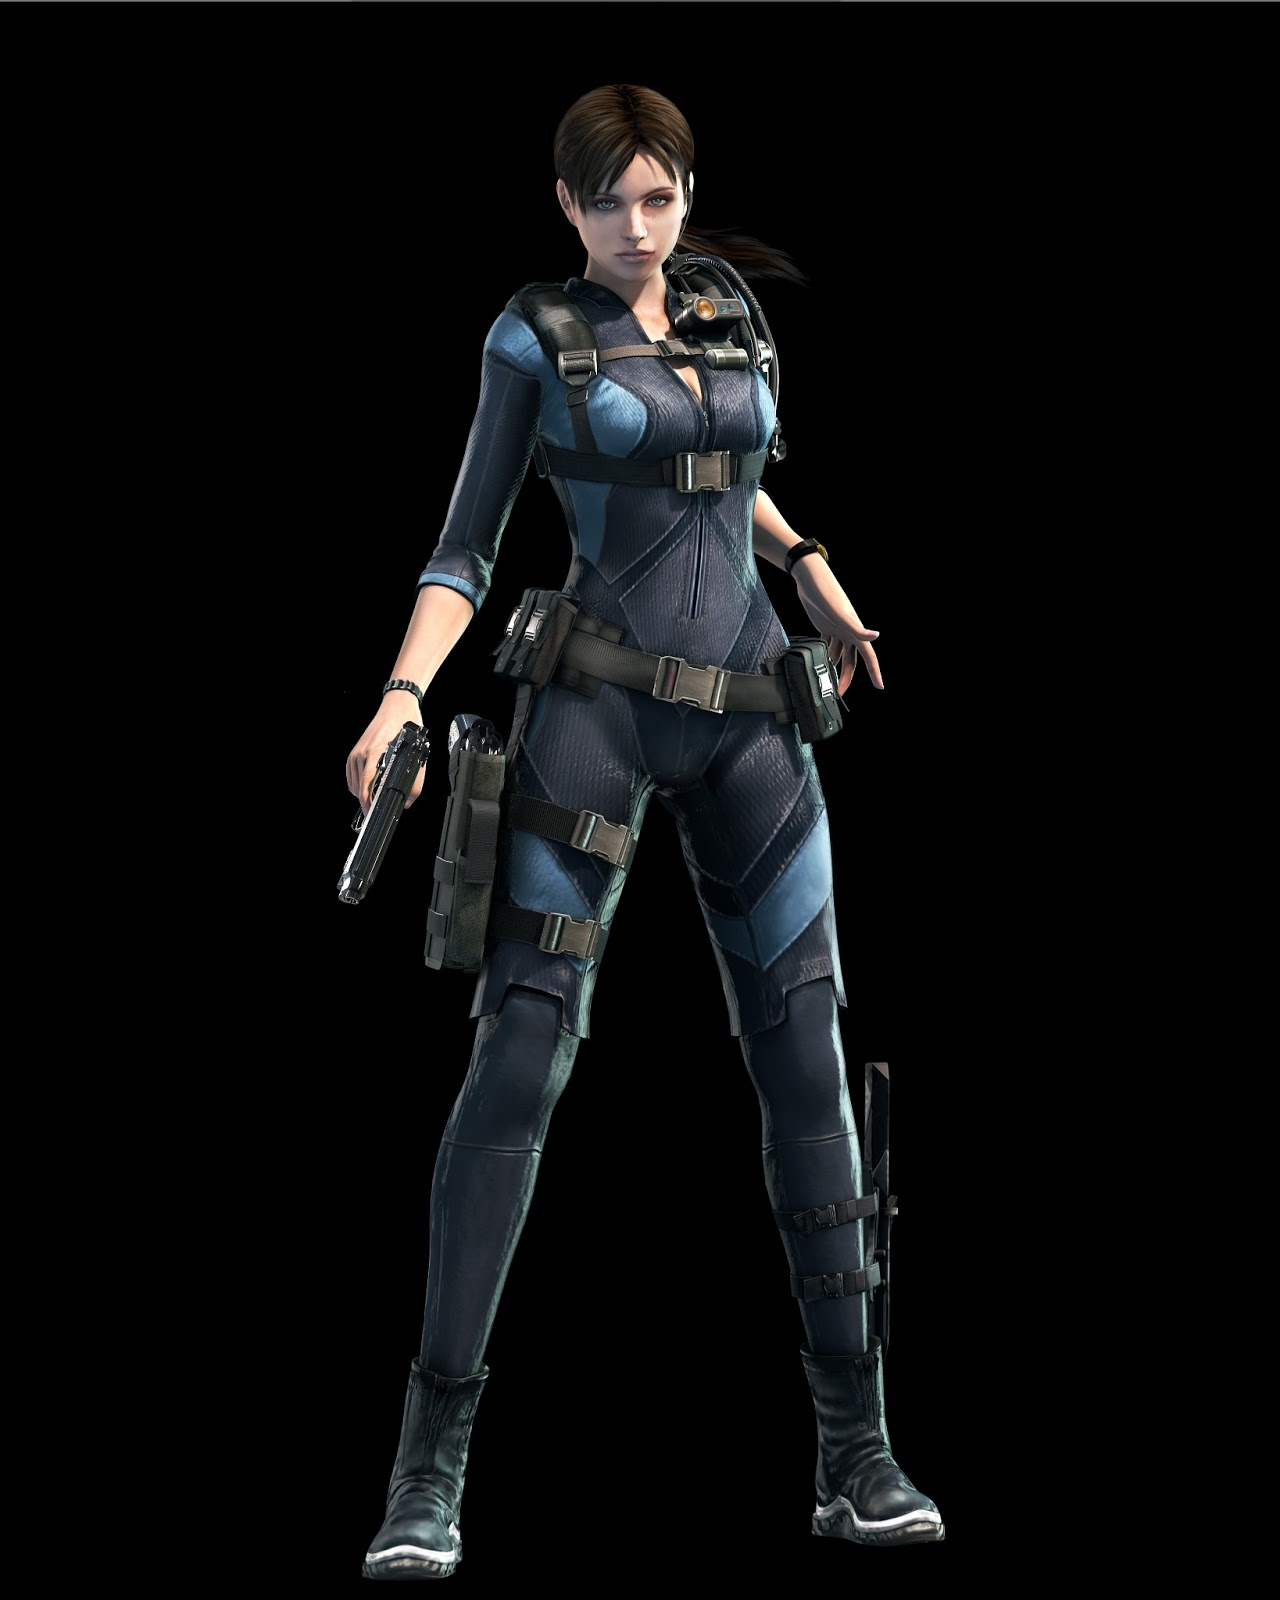 Resident evil:Revelation on Xbox 360,PS3 Wii U!